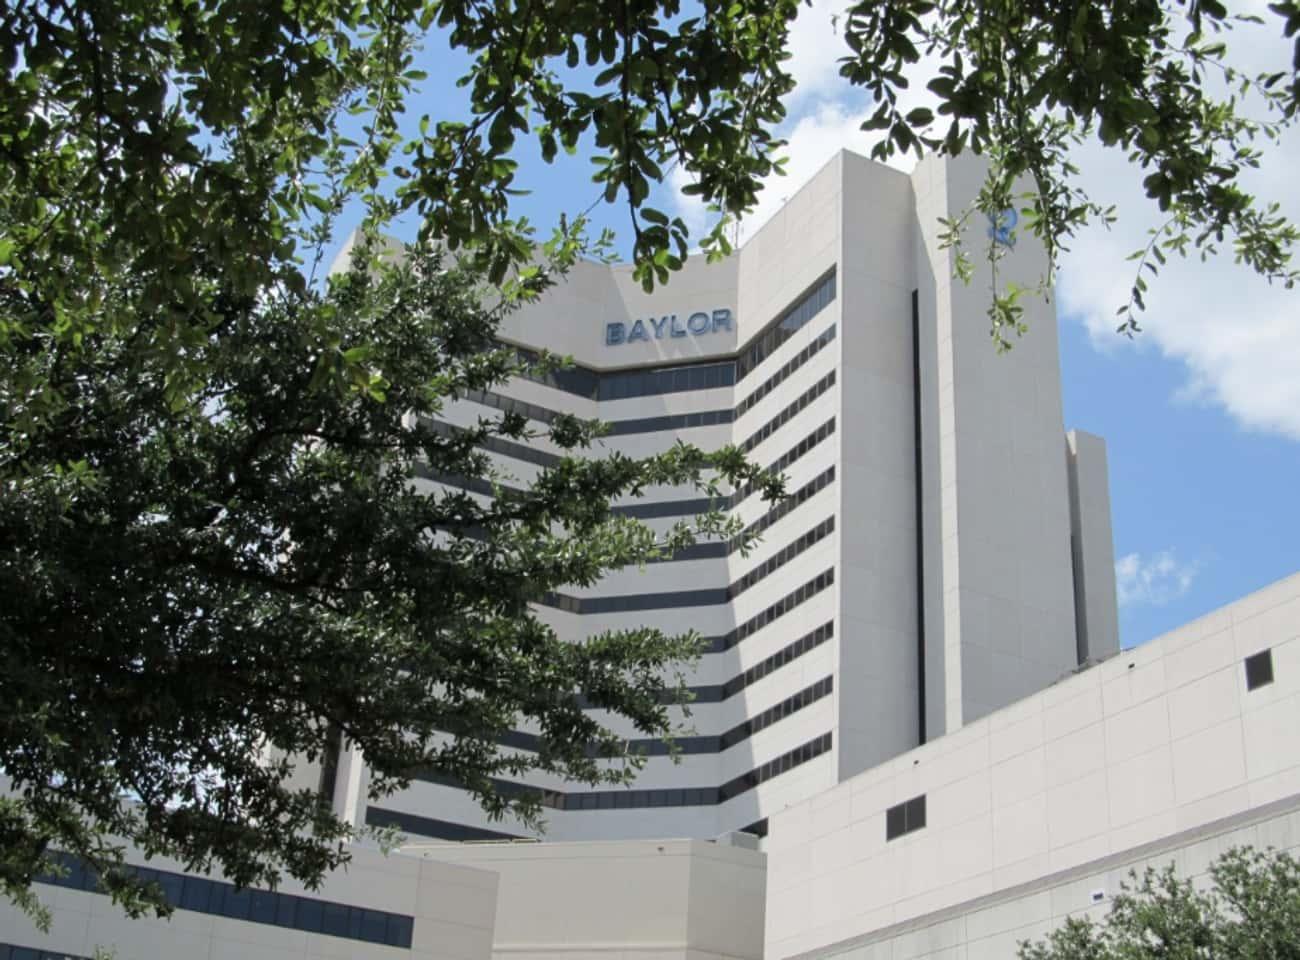 July 2011: Duntsch Is Granted Surgical Privileges At Baylor Regional Medical Center